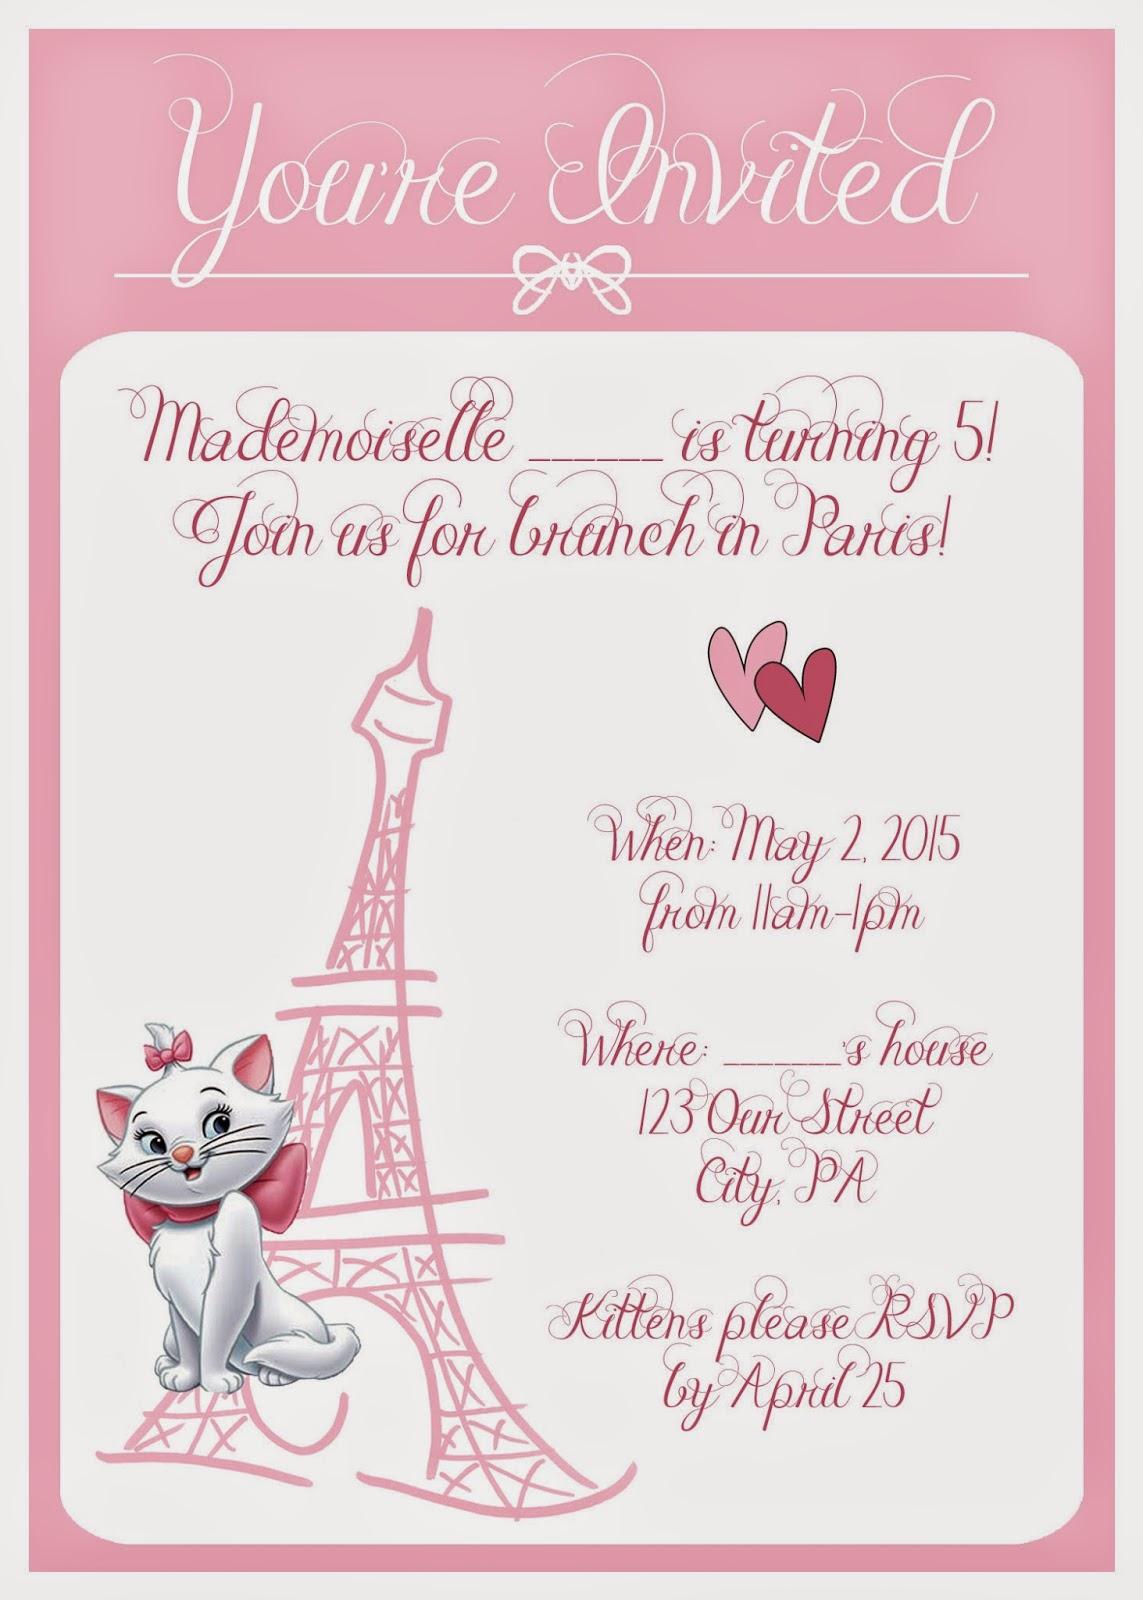 Mom's Tot School: Aristocats / Kitten Birthday Party!